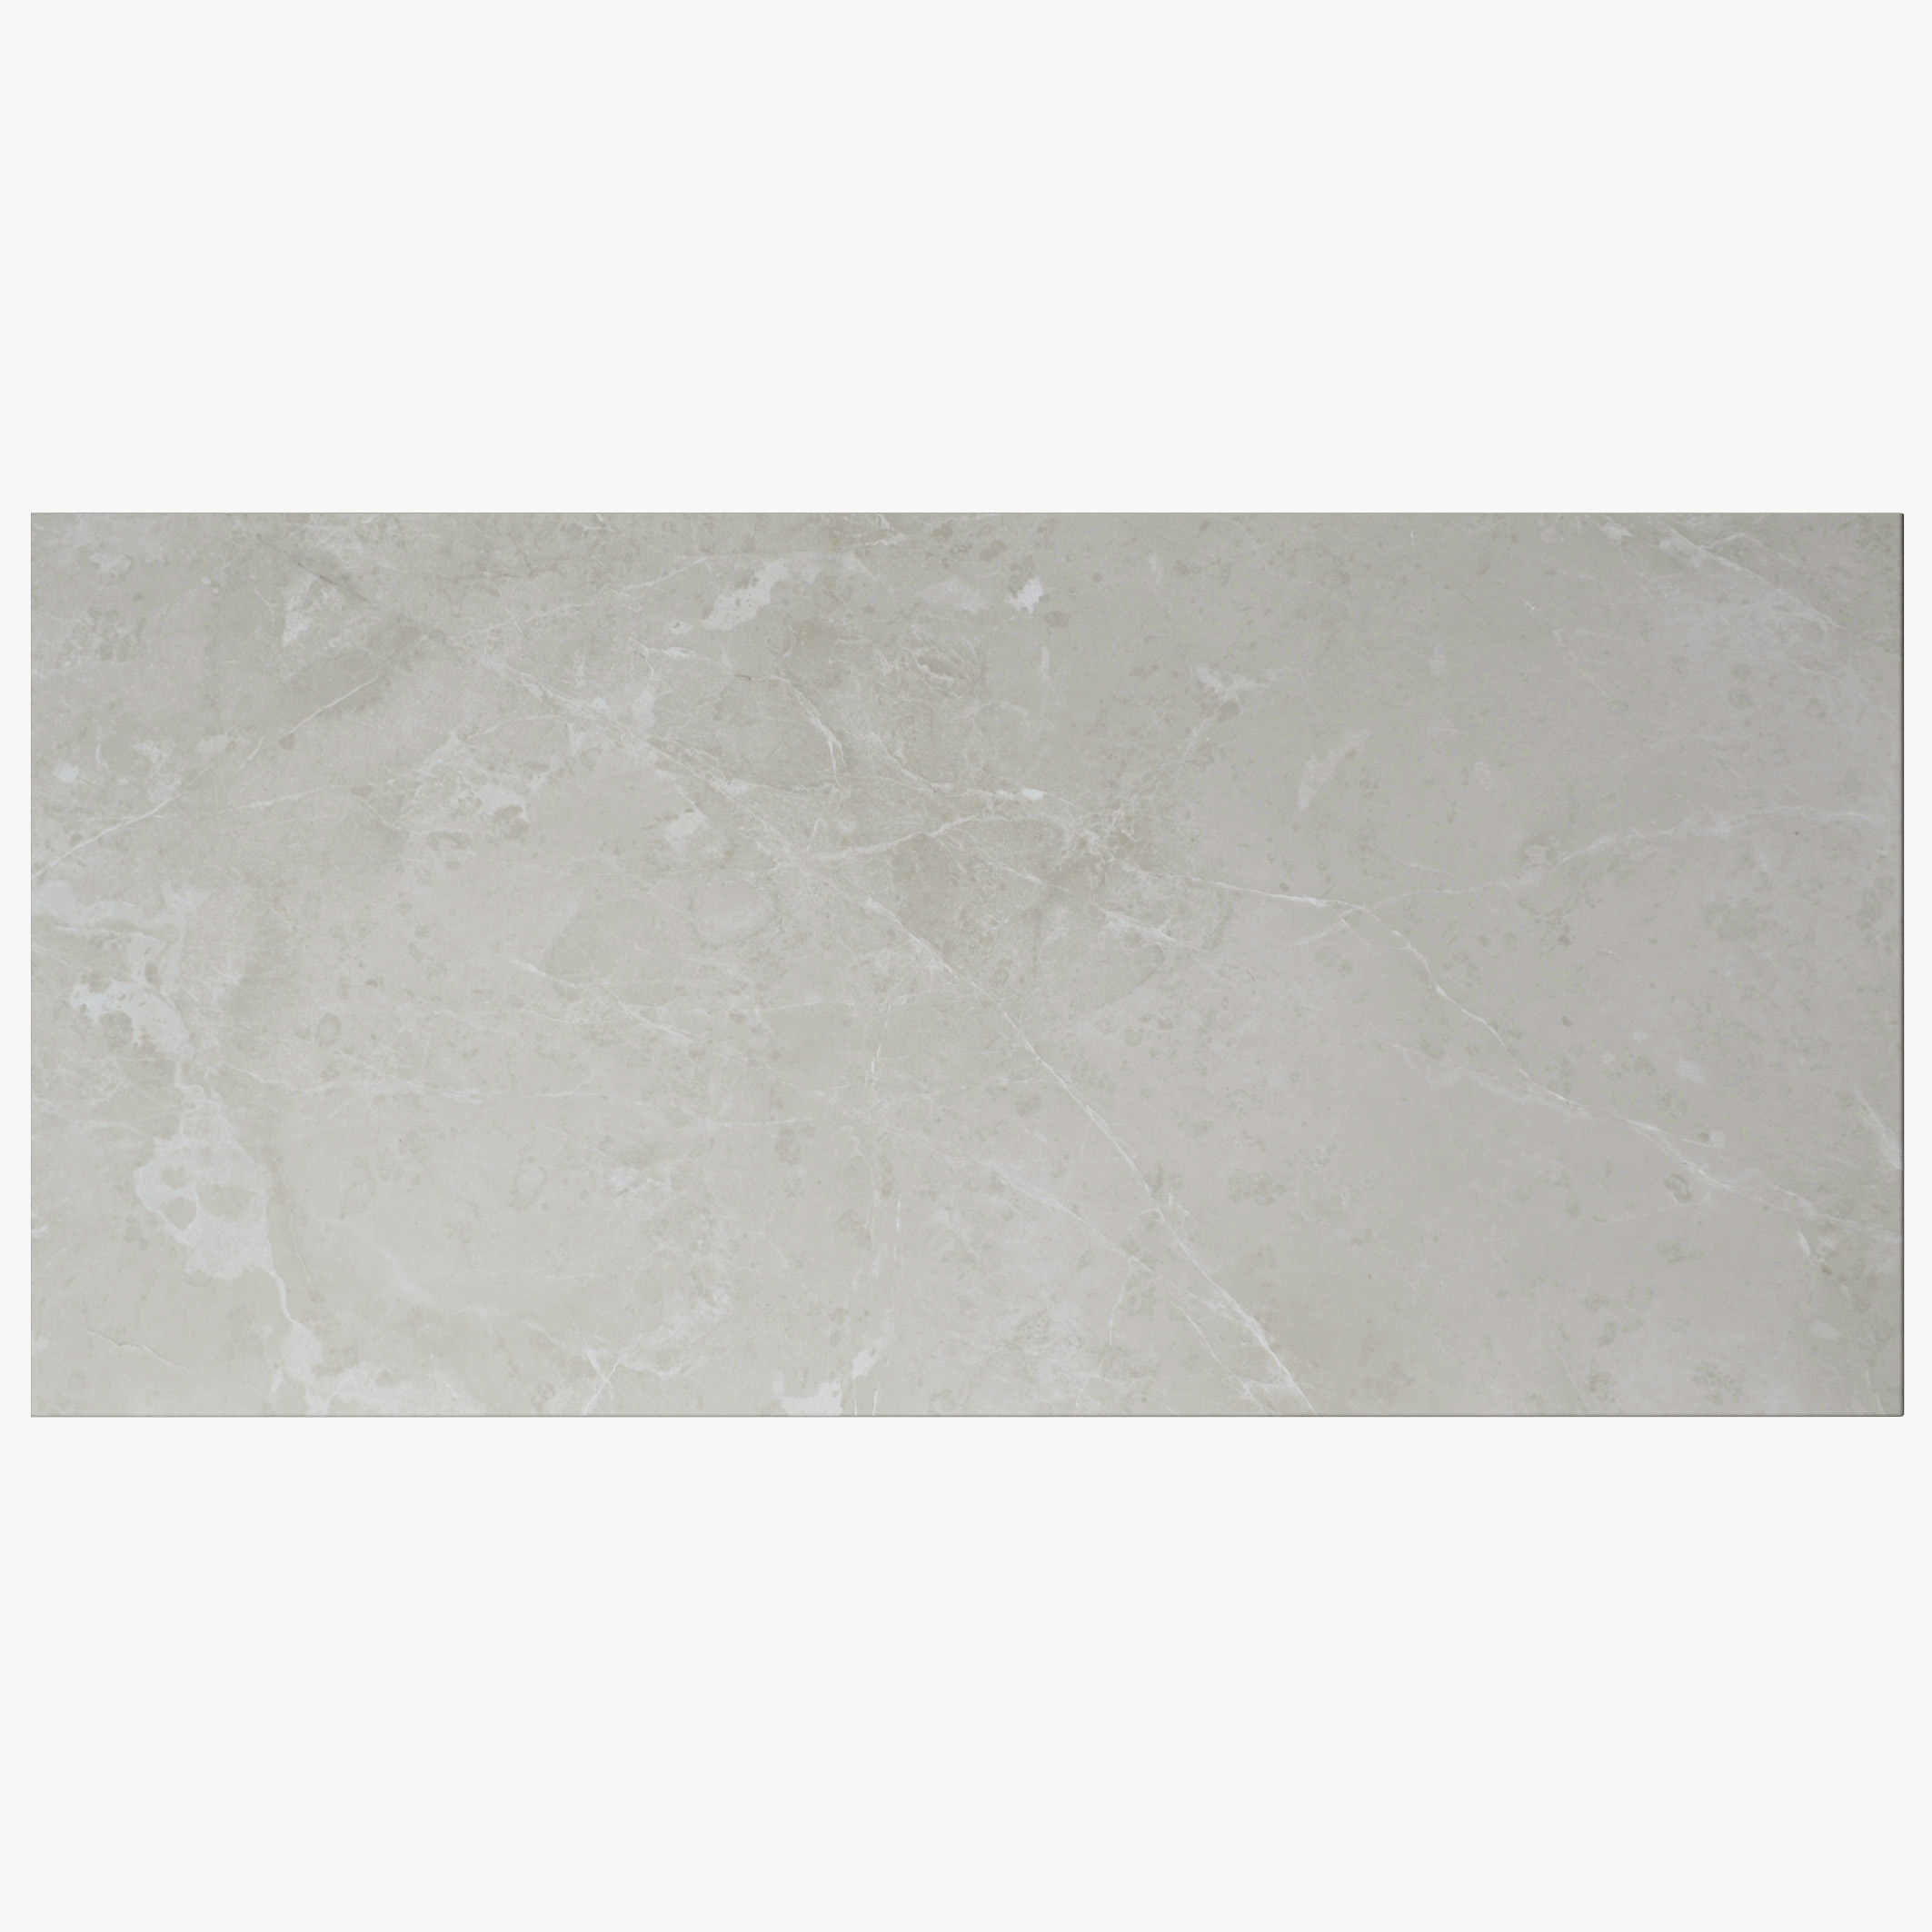 Botticino Beige Polished Marble Tiles 18x36 -marble sale-Atlantic Stone Source